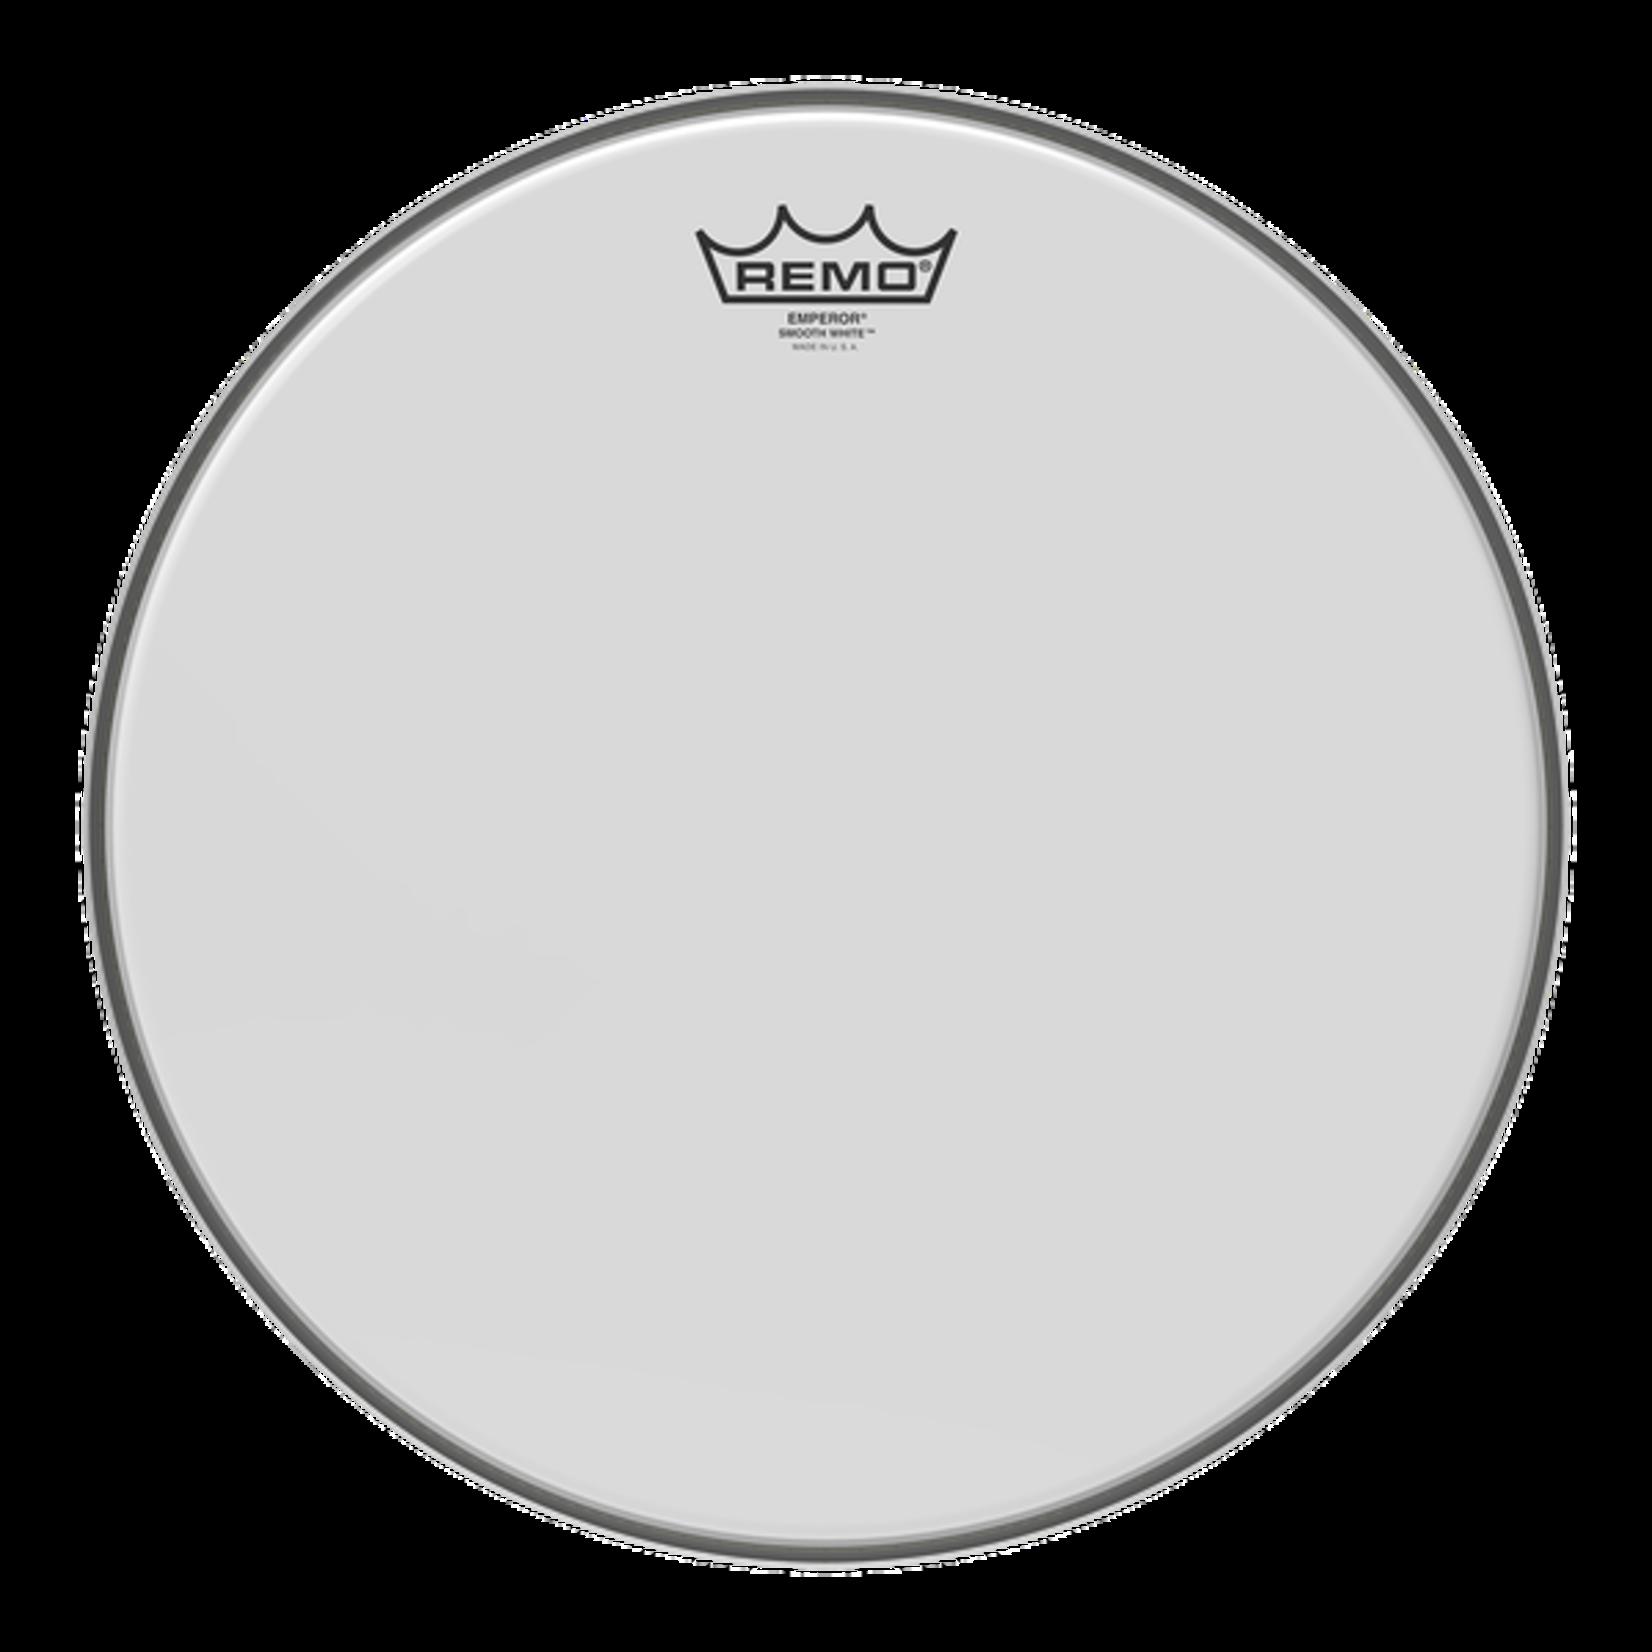 Remo Remo Smooth White Emperor Bass Drum